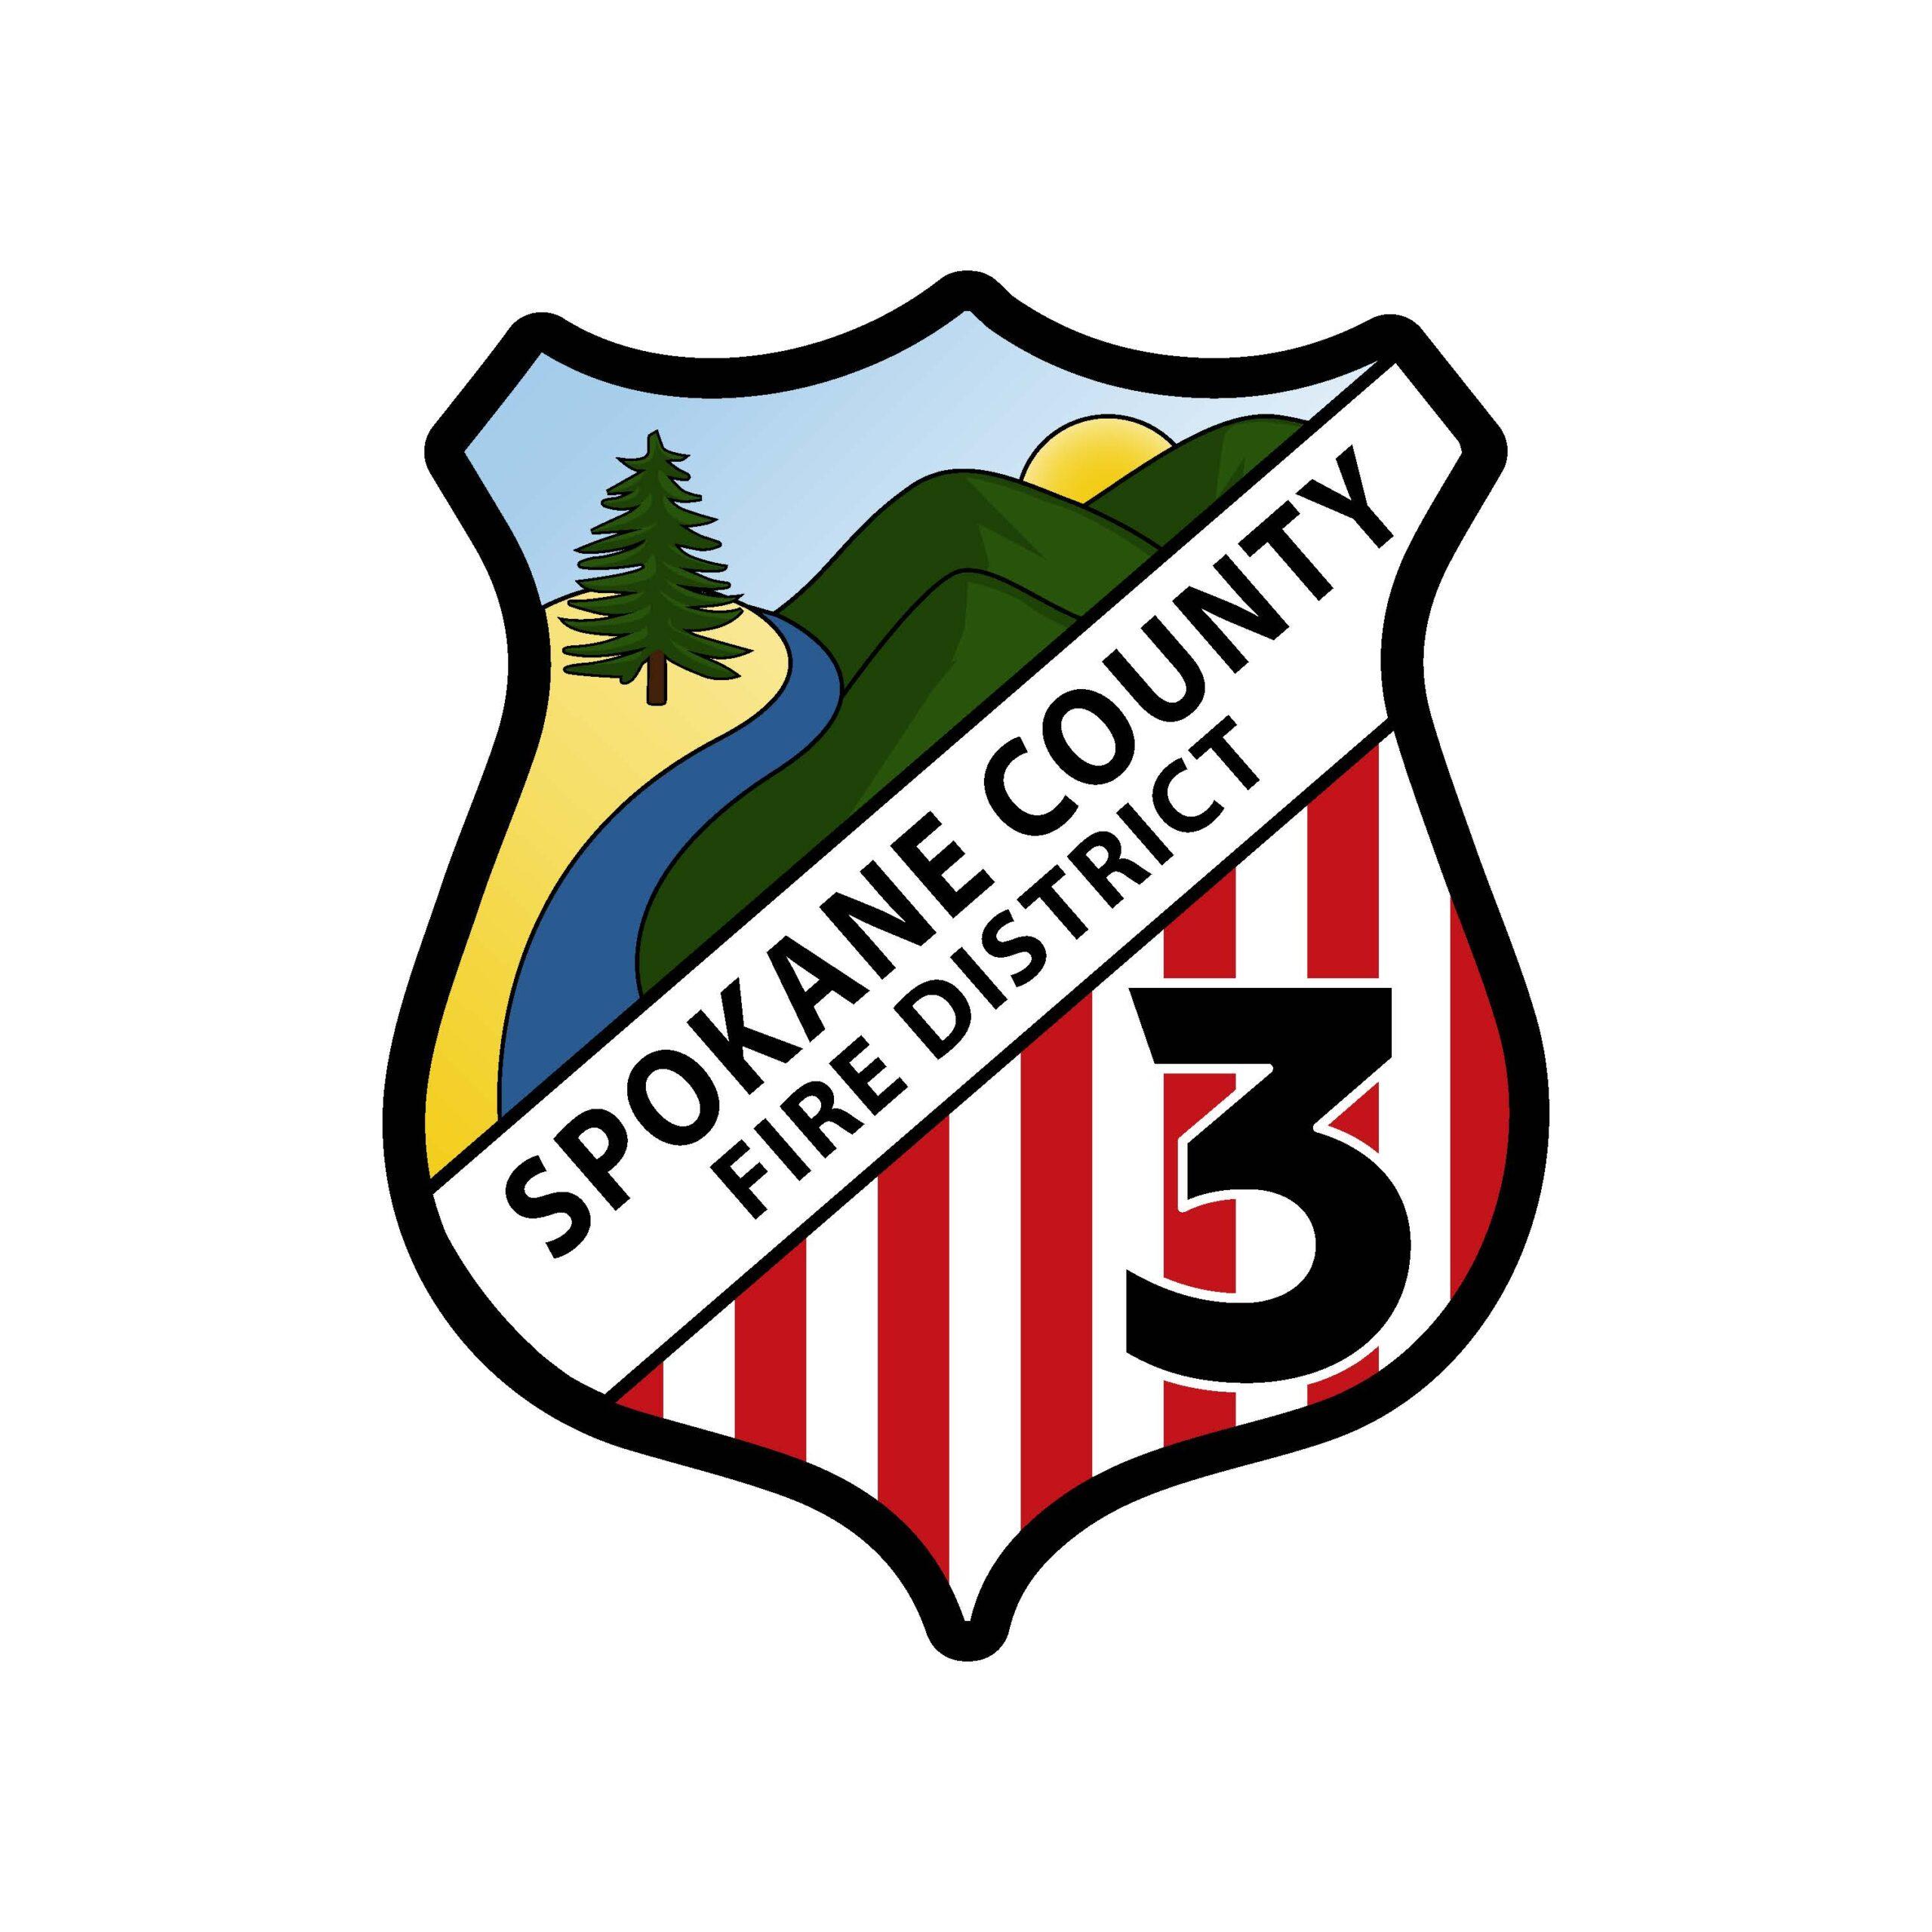 https://wildfireready.dnr.wa.gov/wp-content/uploads/2021/07/FD-3-Logo-scaled.jpg